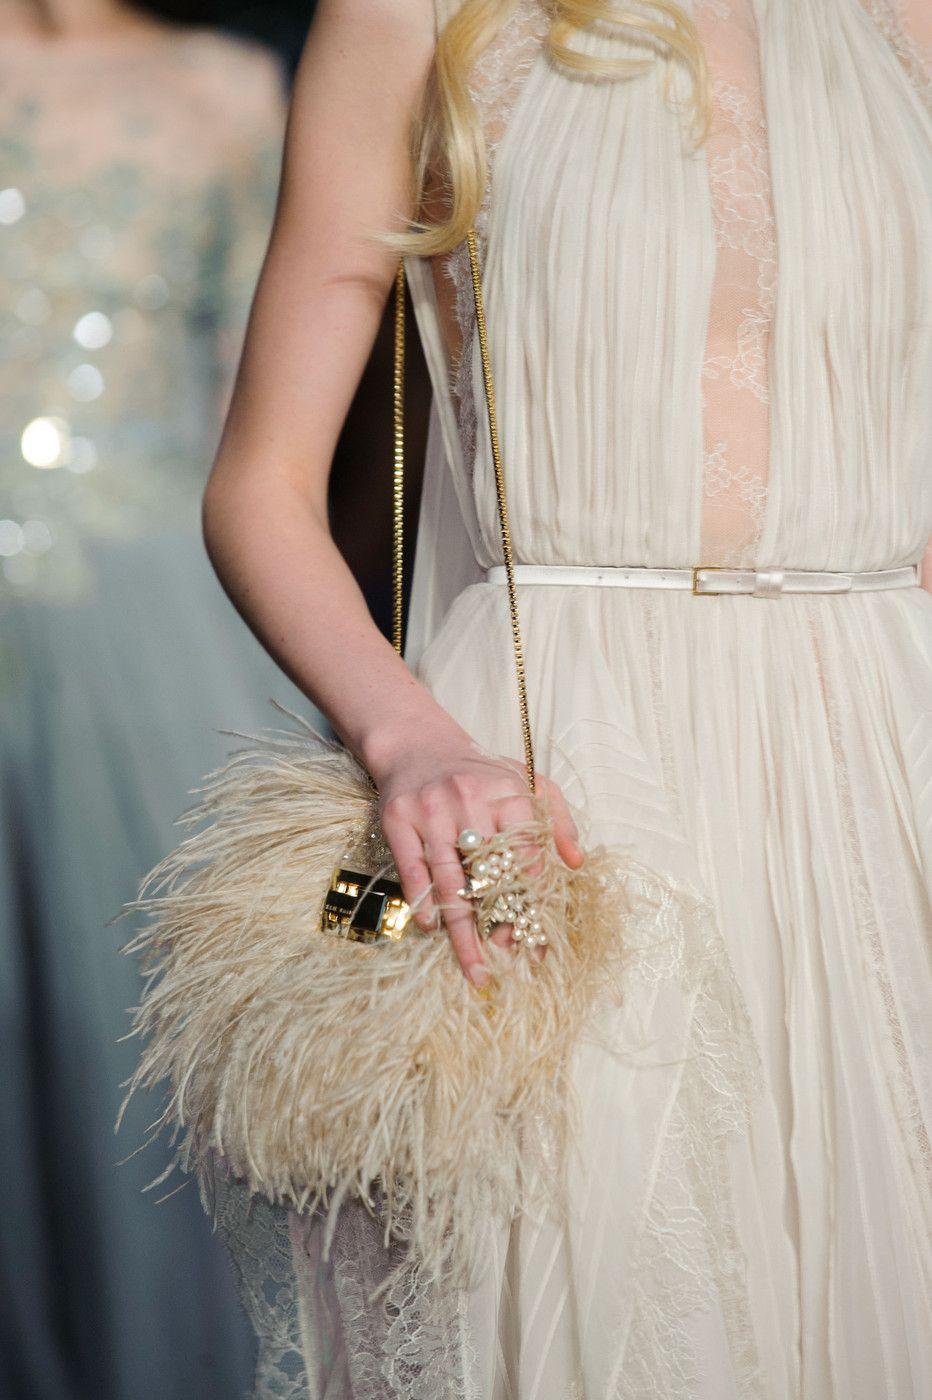 Elie Saab Haute Couture Spring Summer 2015 #details #handbag